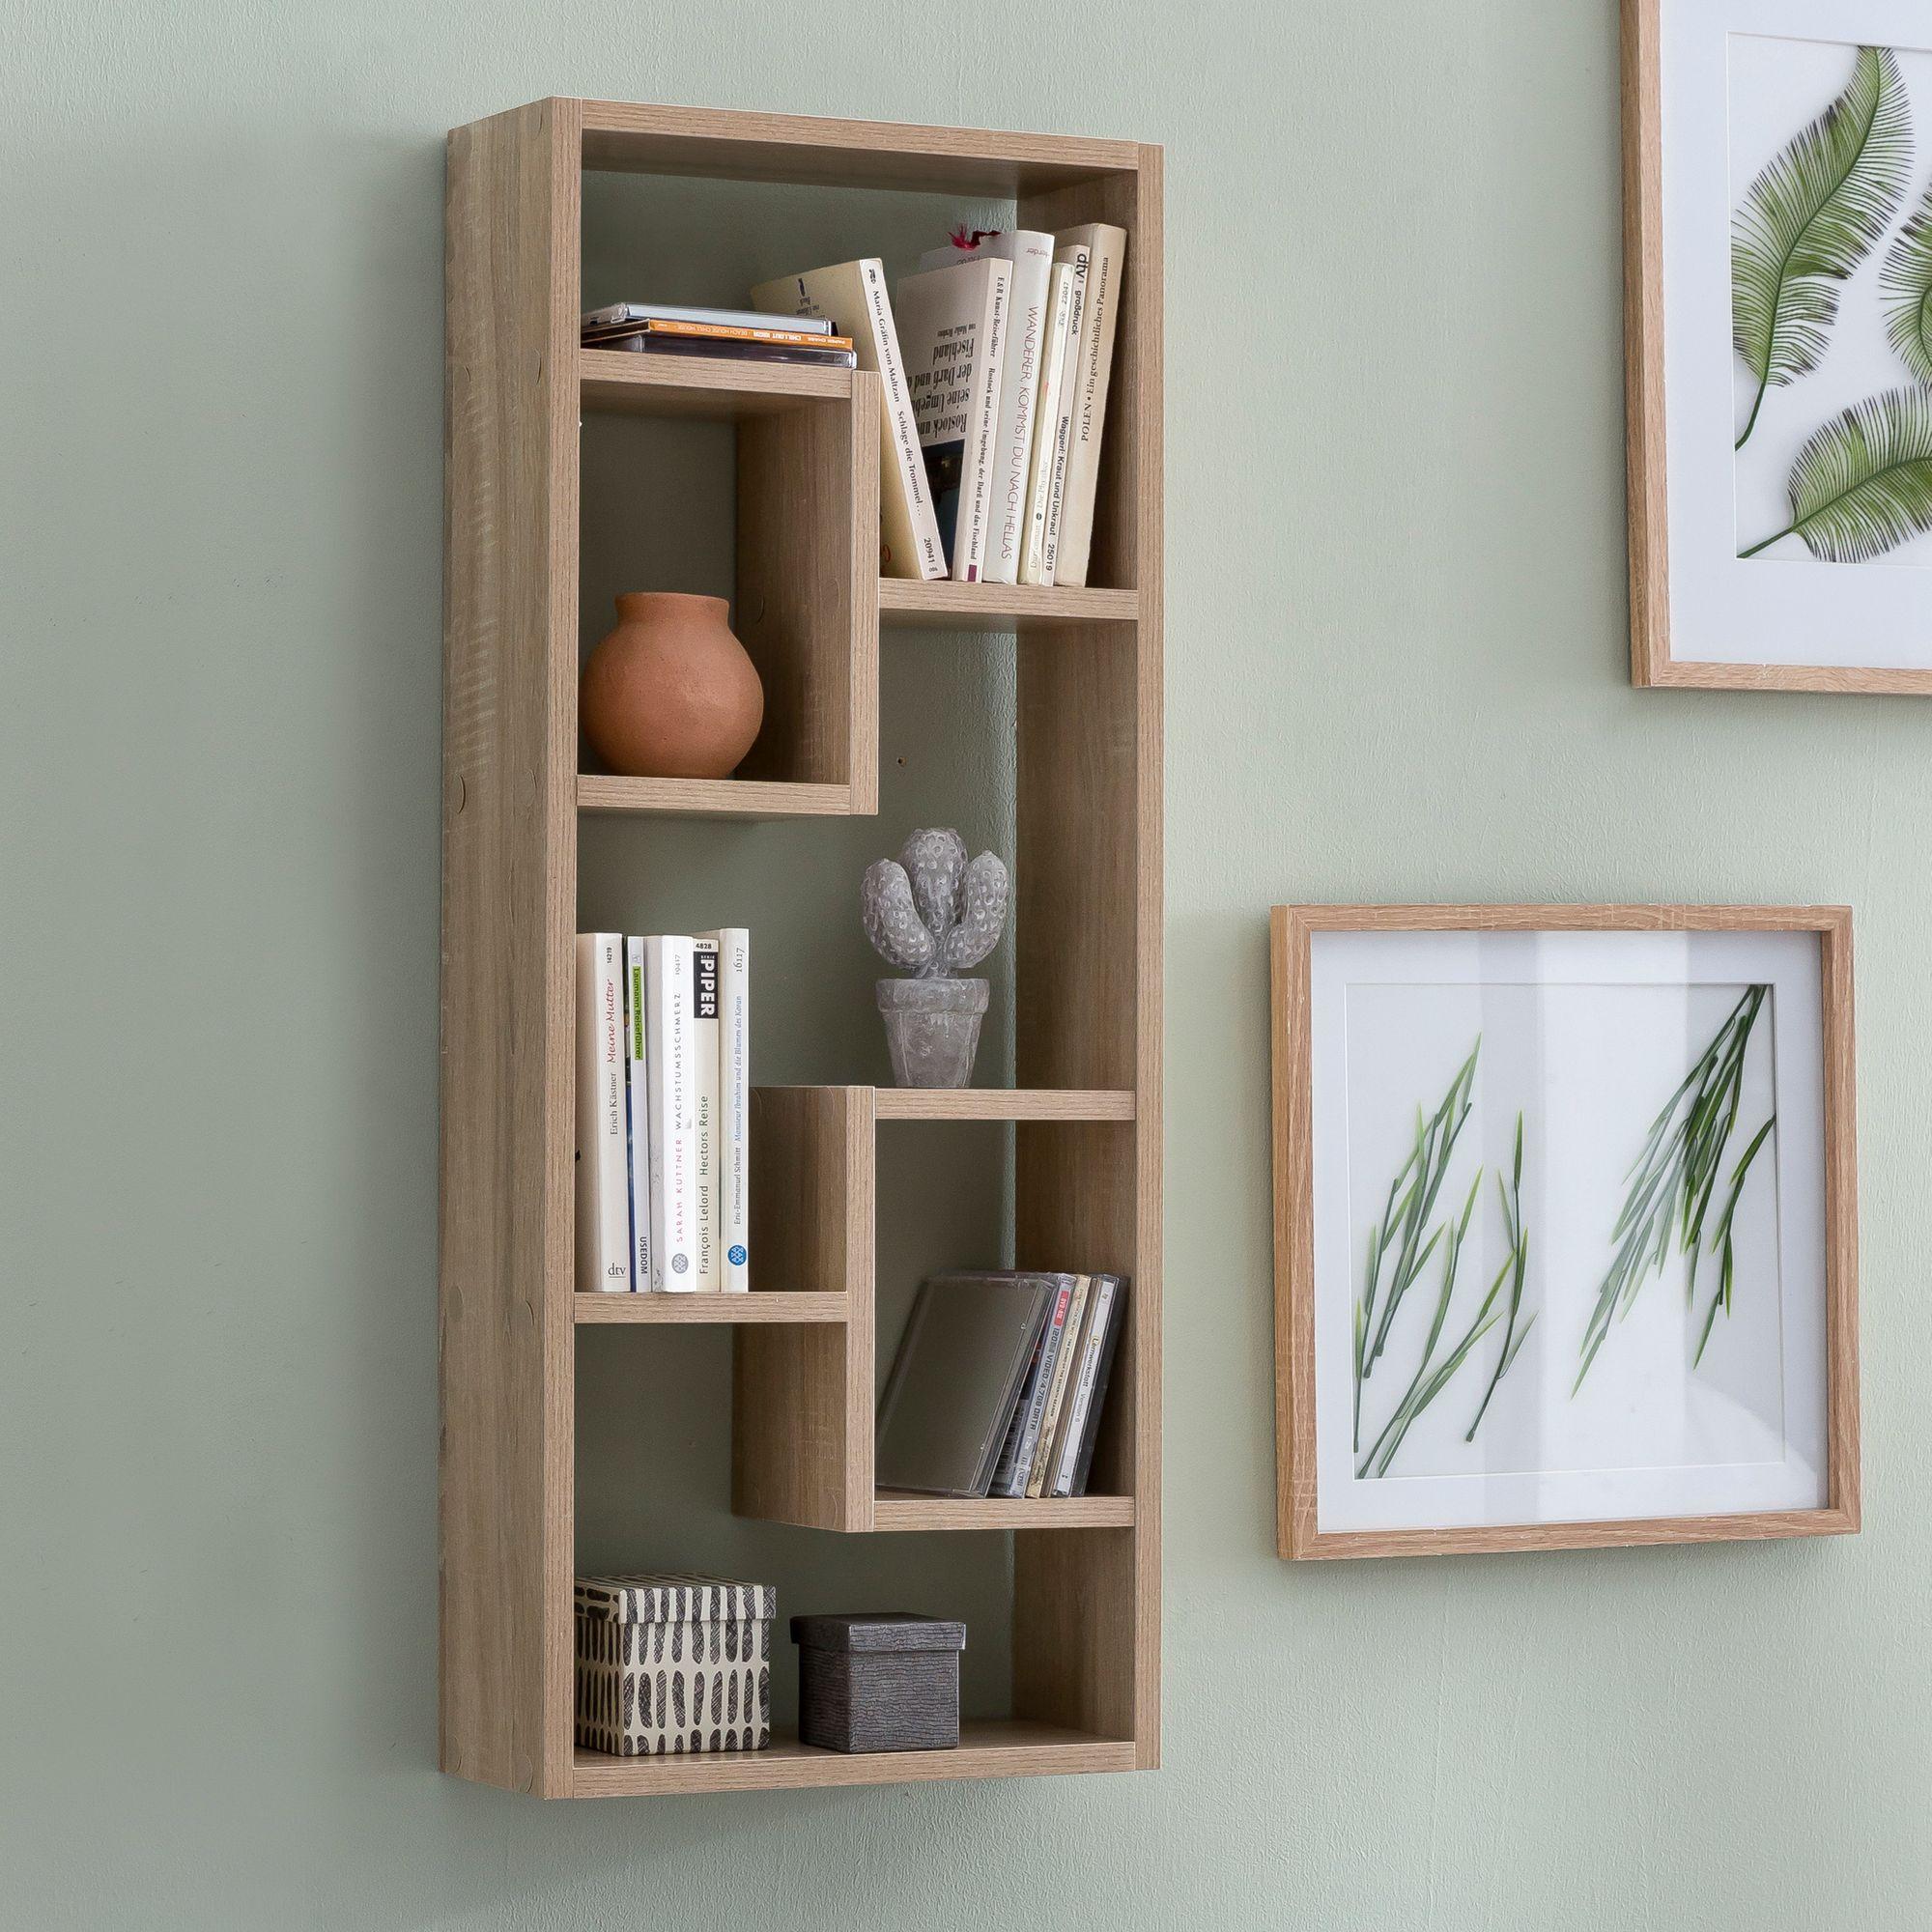 Finebuy Wandregal Rose Hangeregal 36 X 90 X 13 5 Cm Holz Wandboard